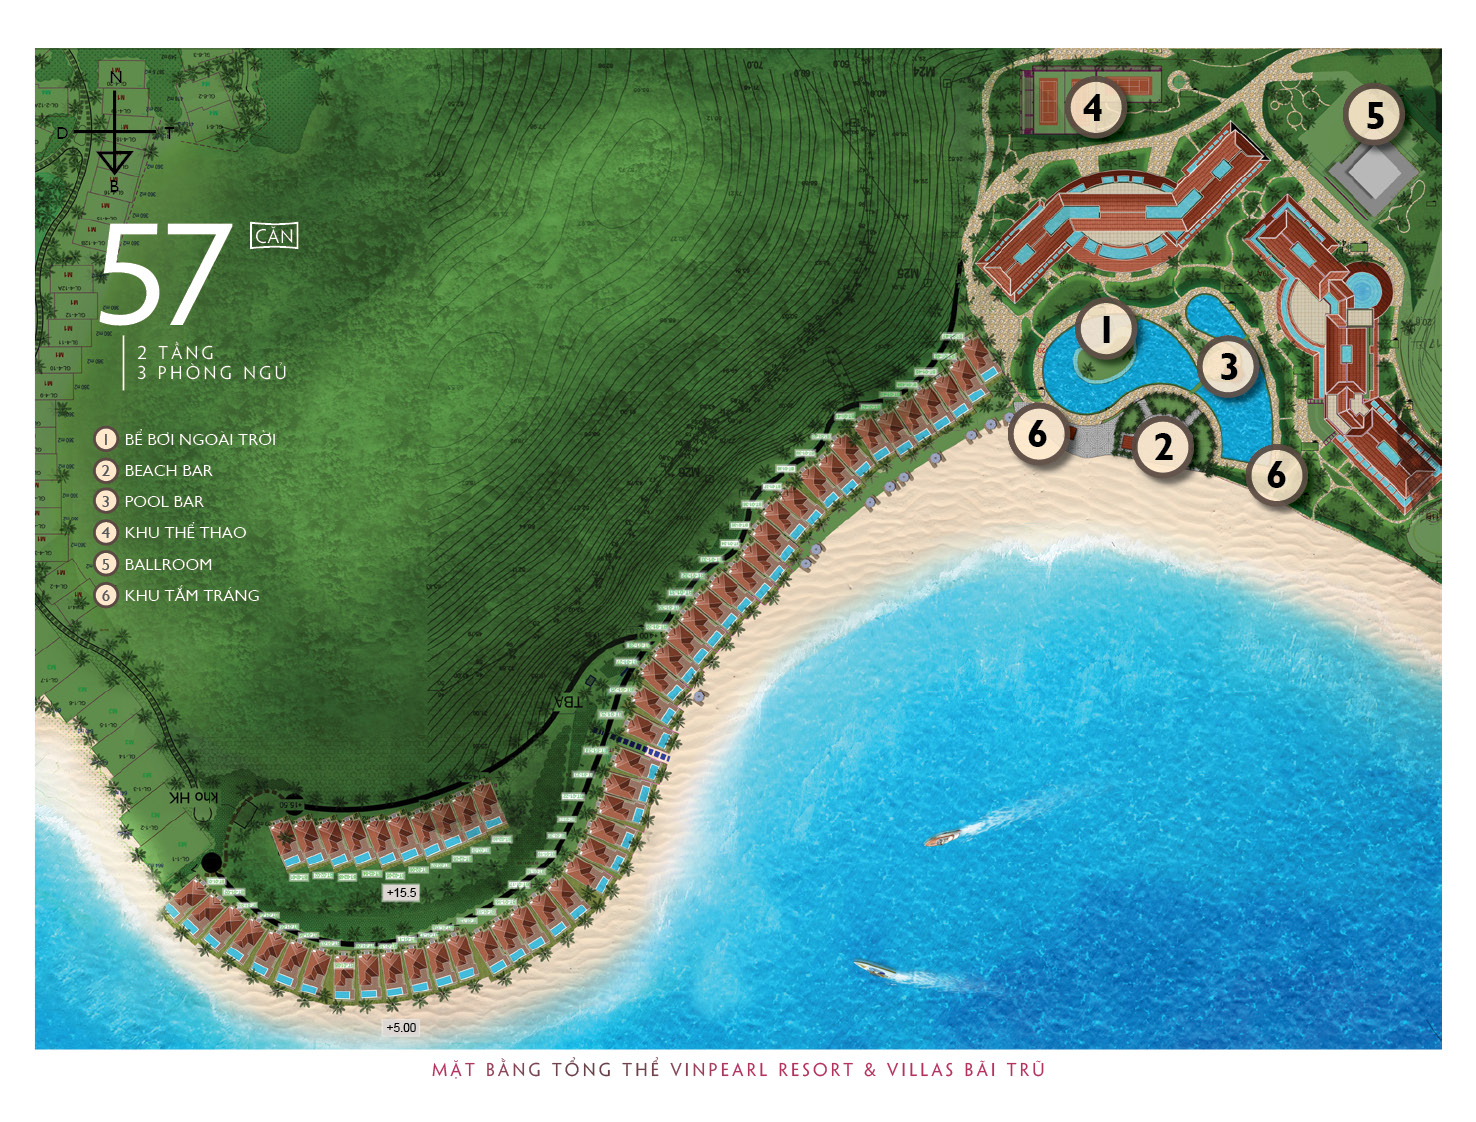 mat bang tong the du an Vinpearl Nha Trang Resort tai Bai Tru